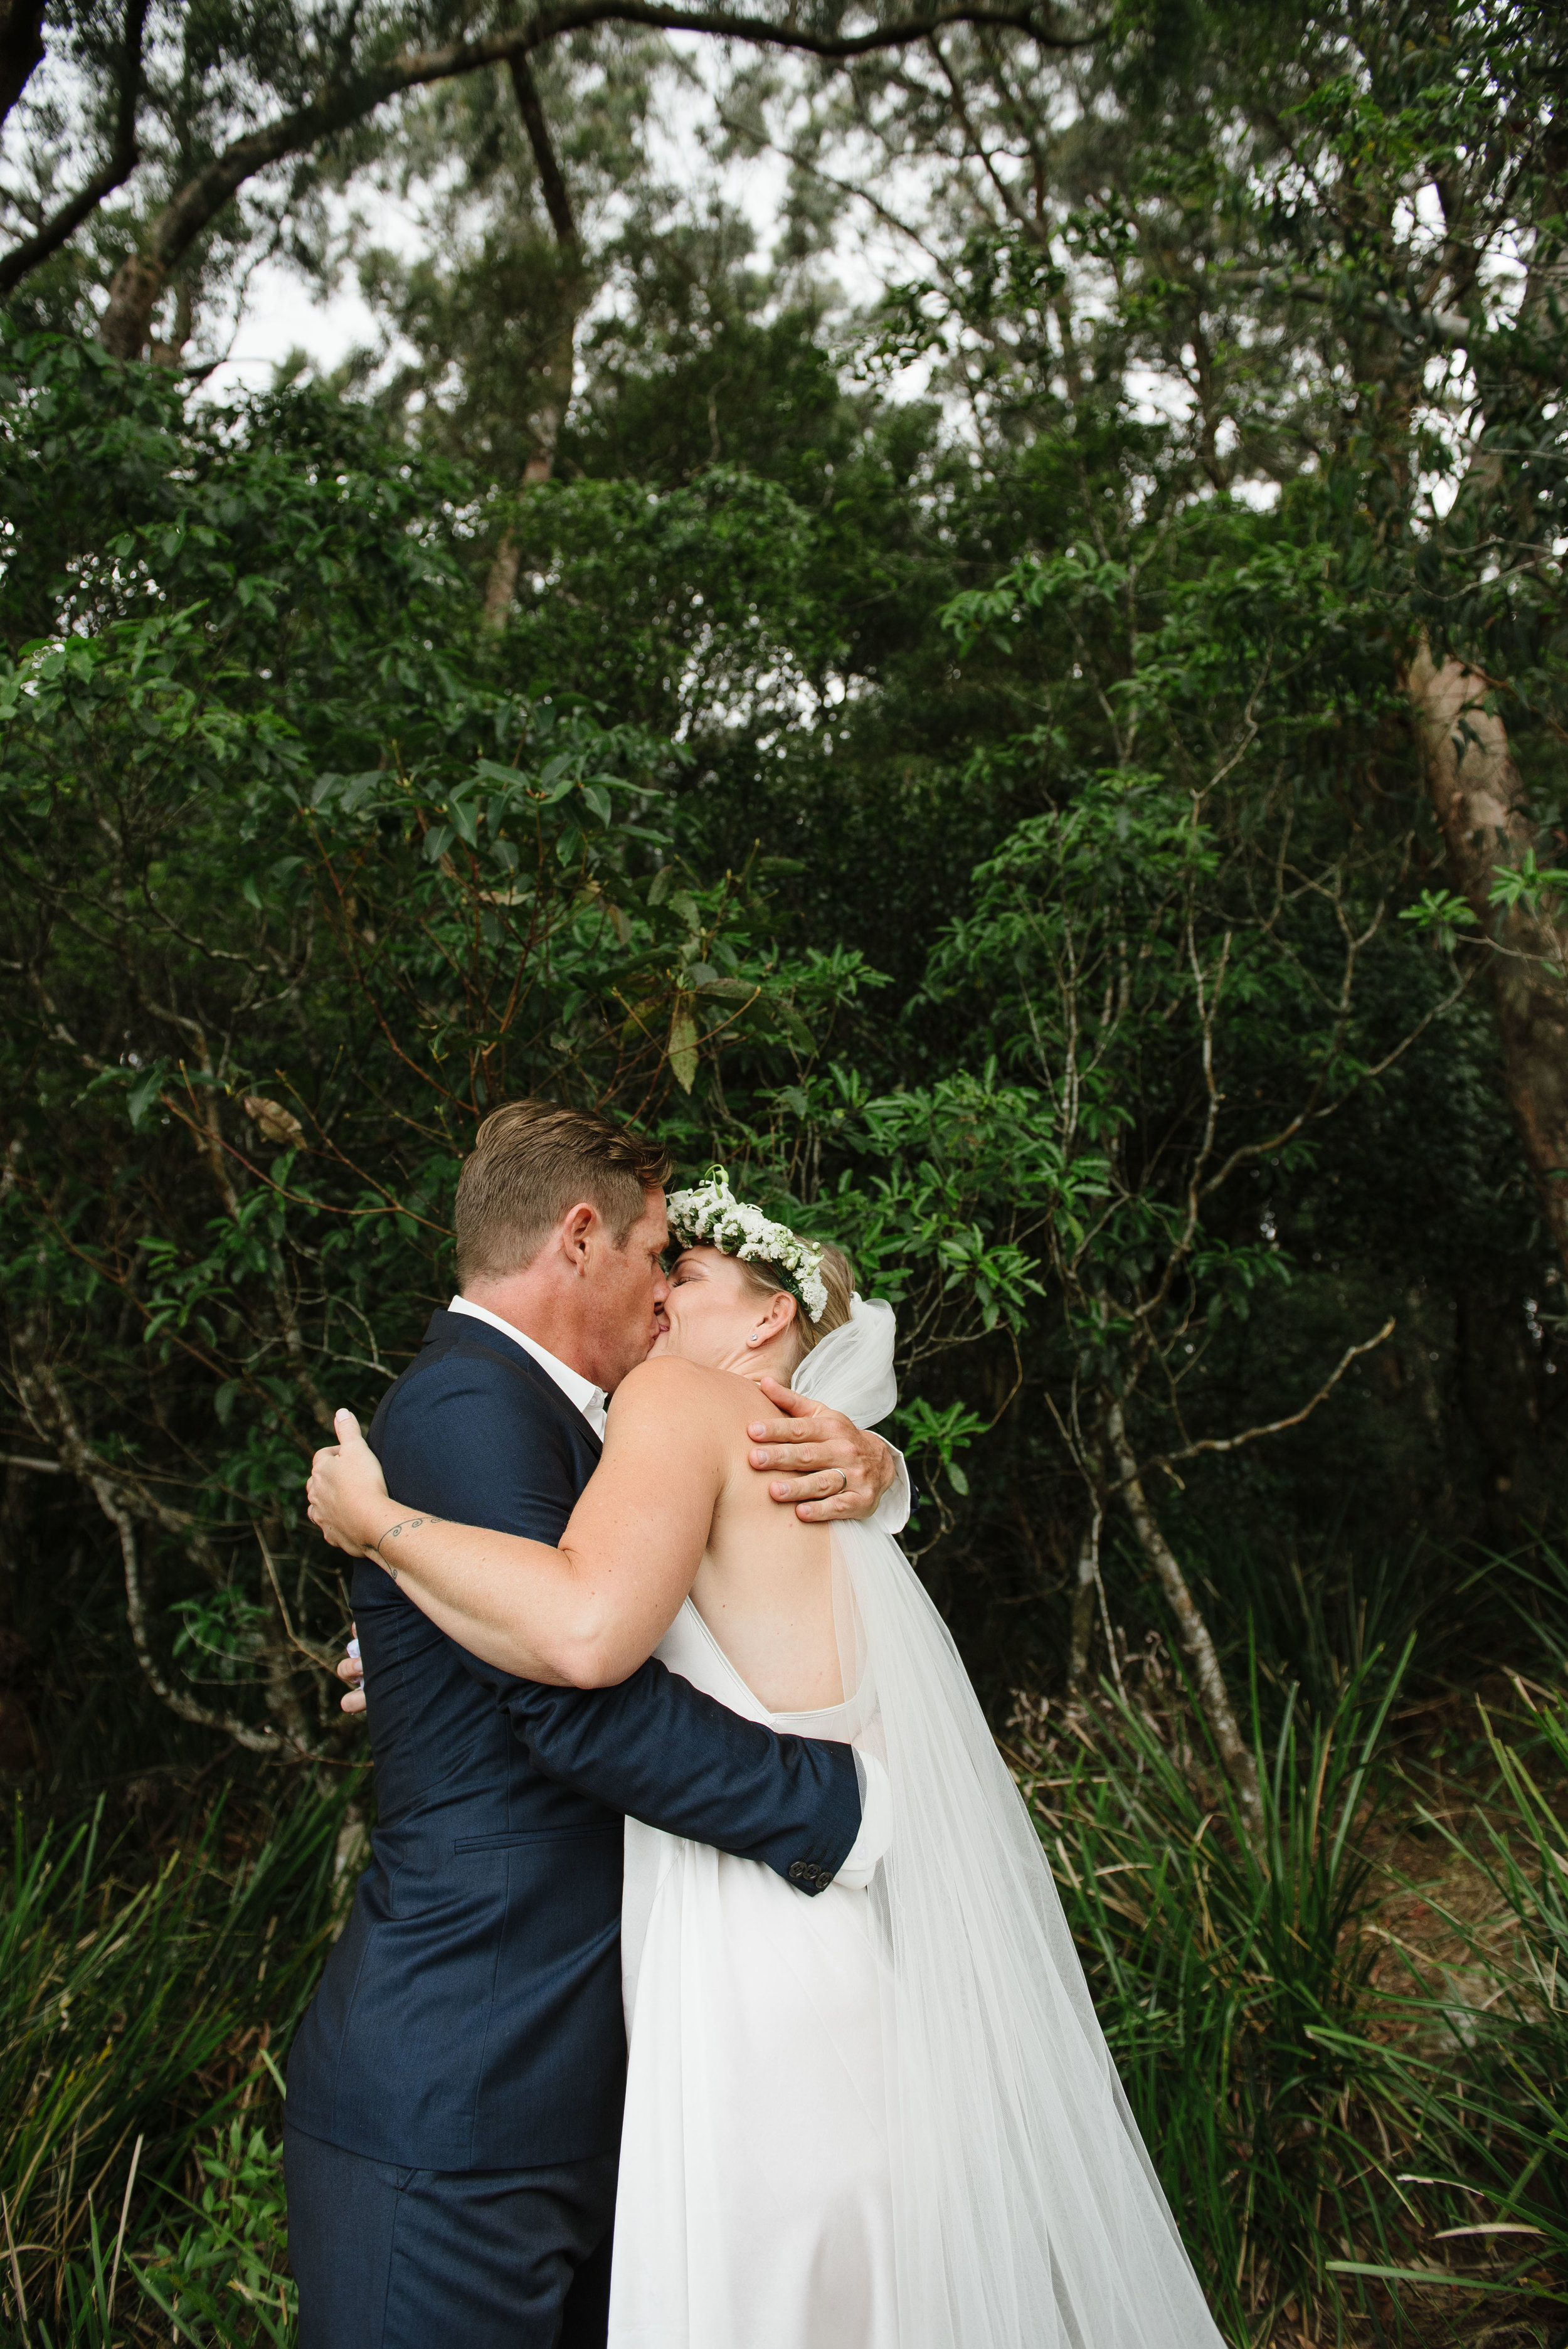 Carla and Luke- wedding photographer, byron bay wedding and family photographer, tweed heads wedding and family photography-199.jpg